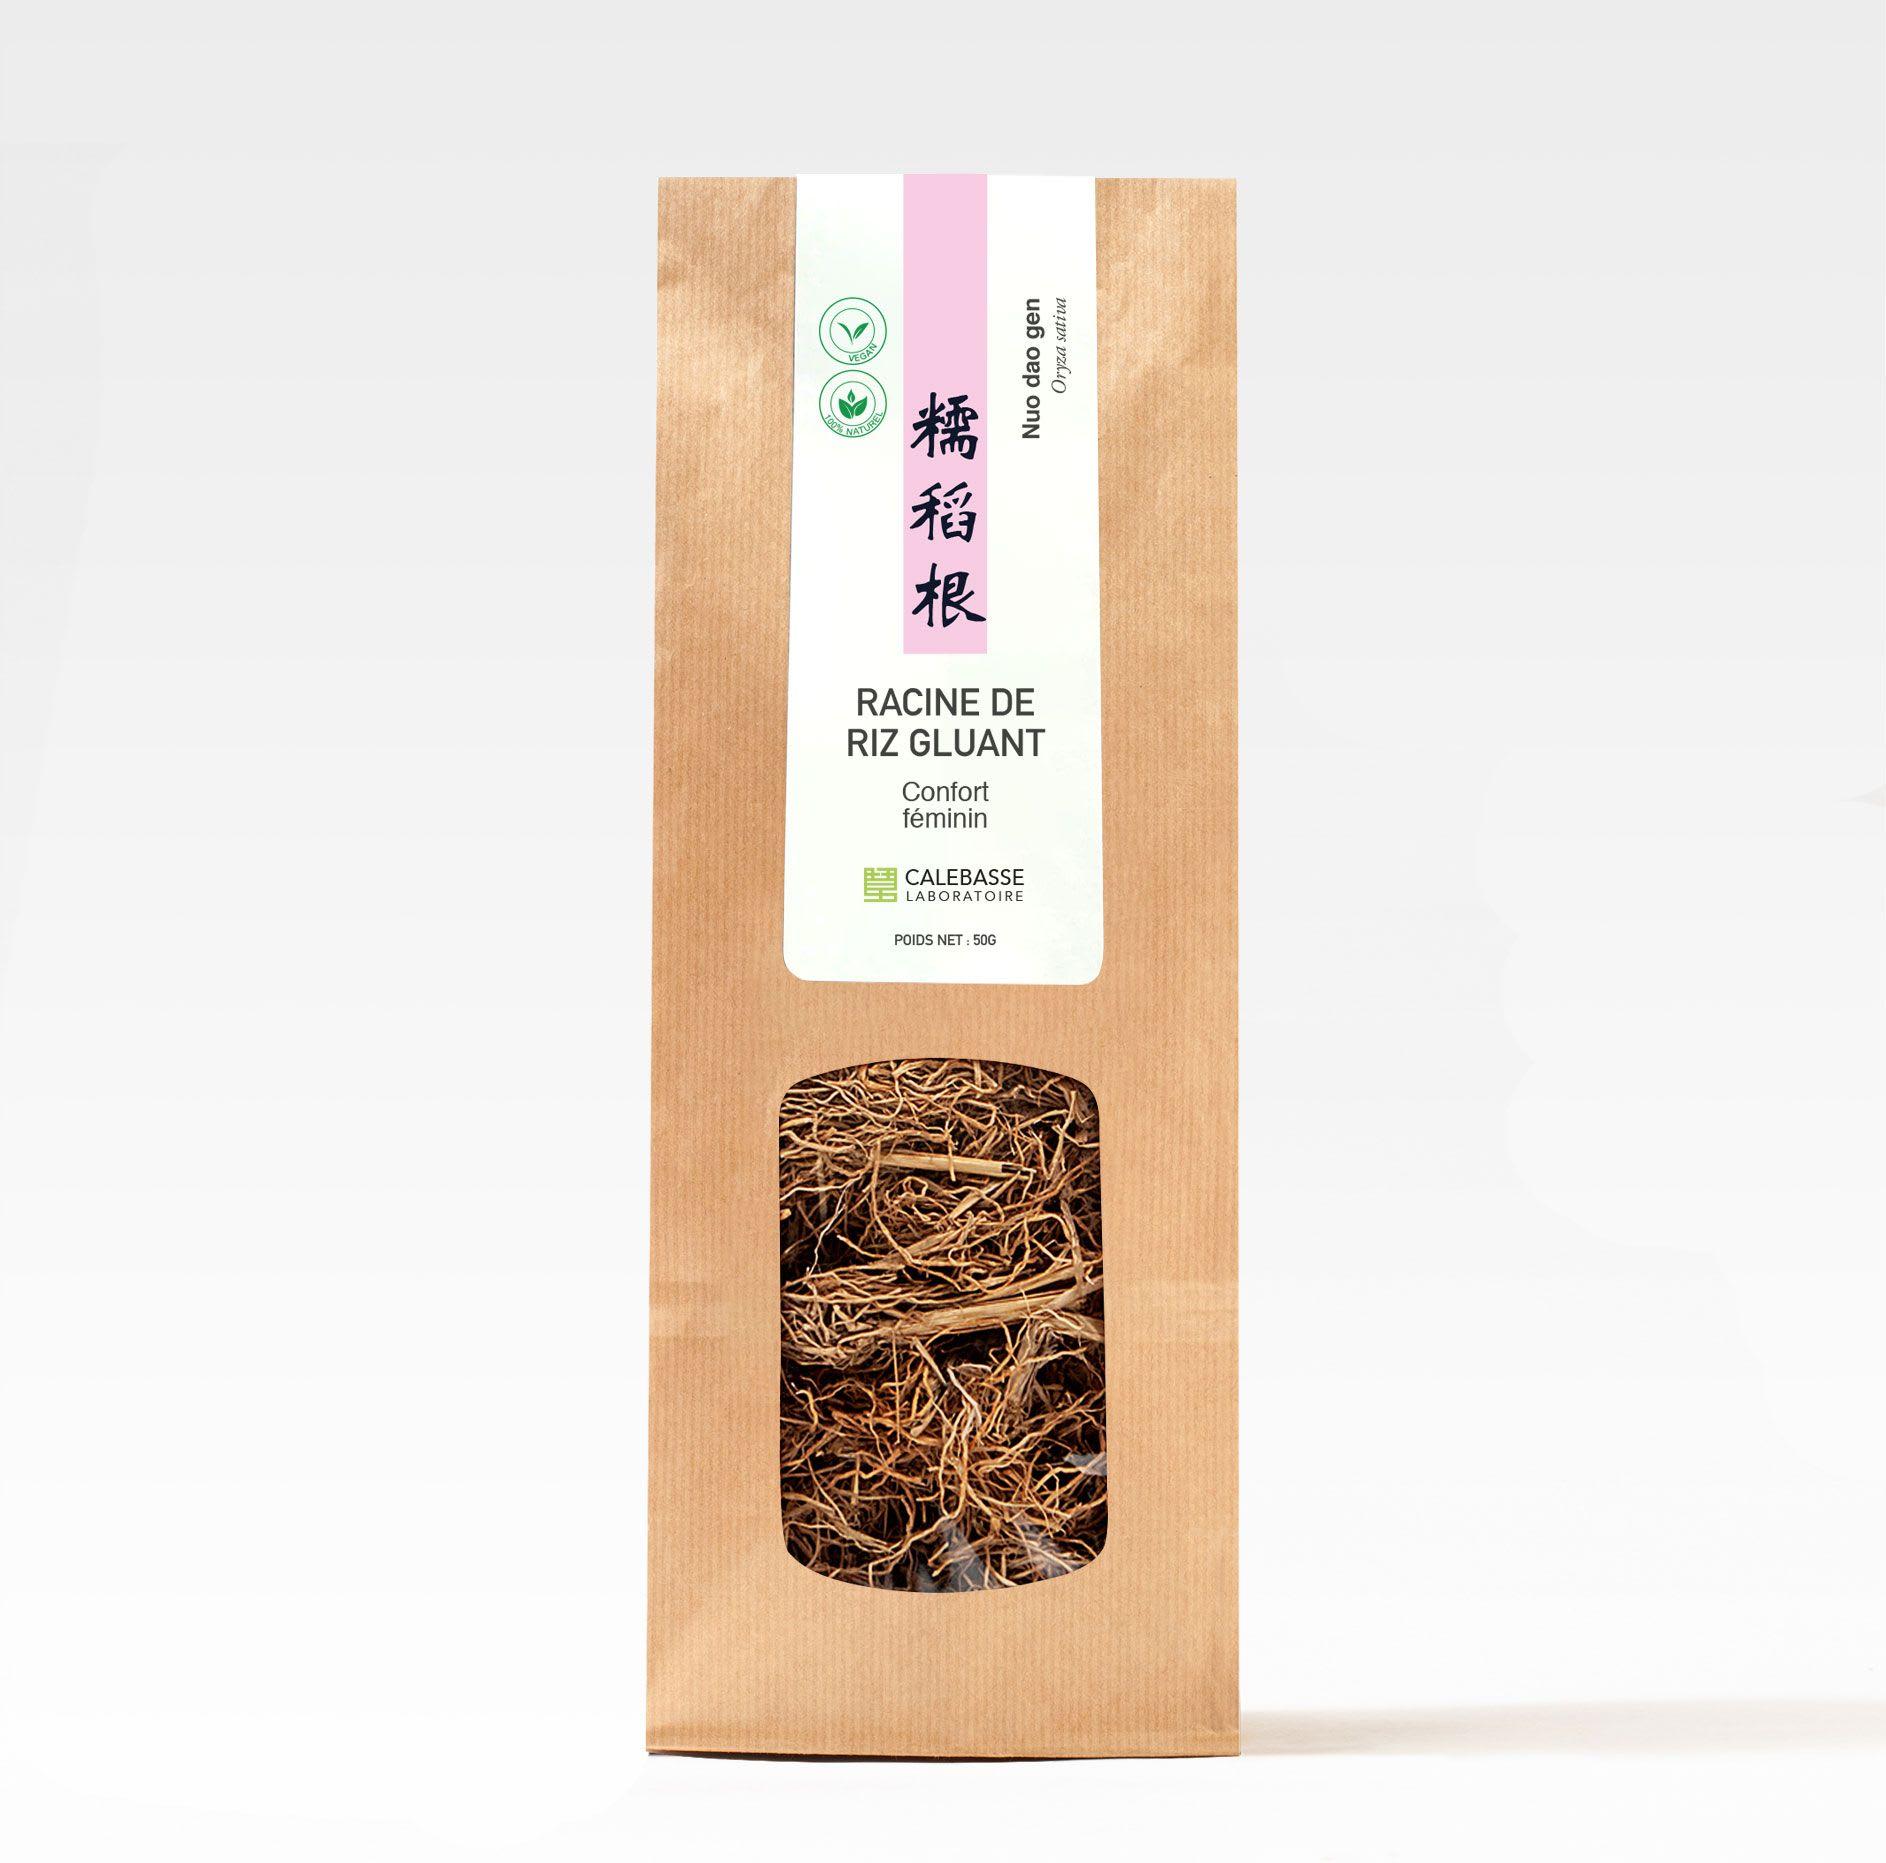 Image de Nuo dao gen - Racine de riz gluant